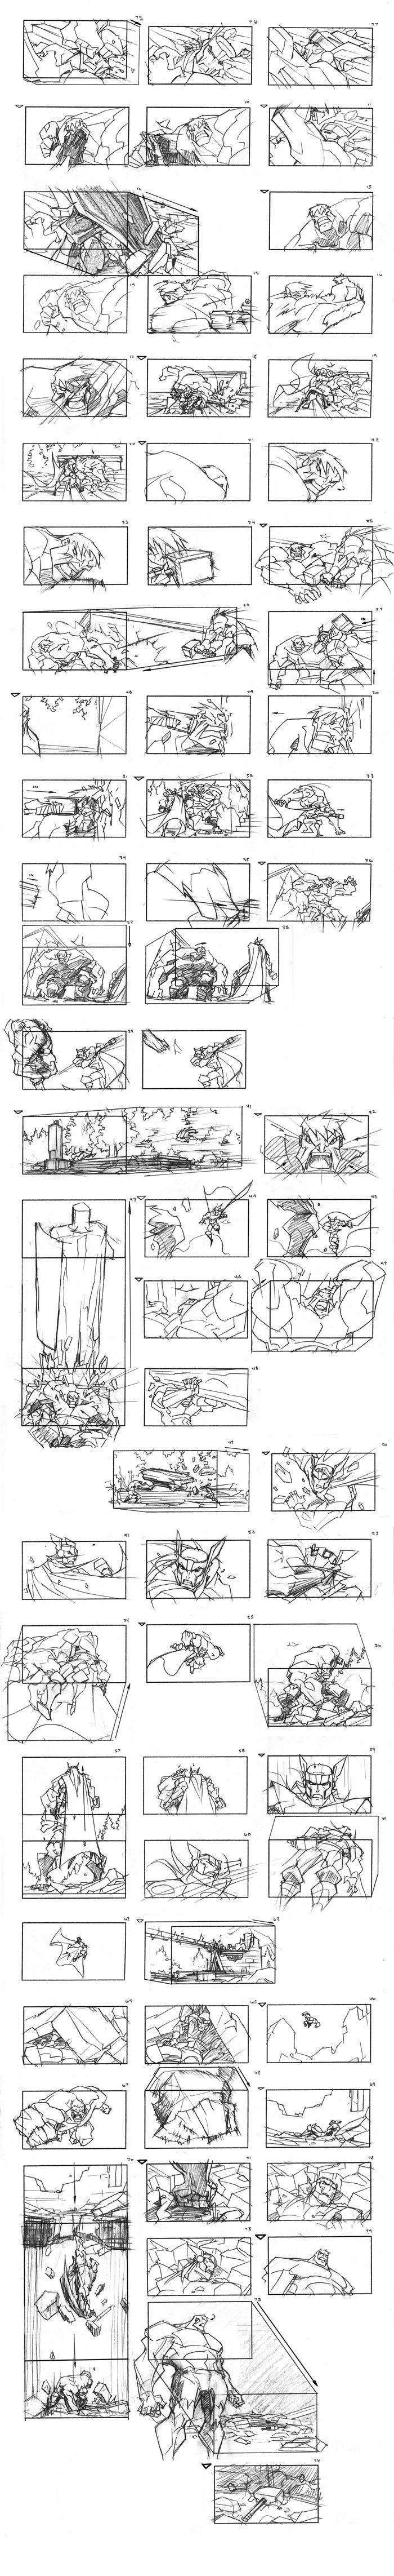 Thor Storyboard Pt. 2 by samliu on deviantART